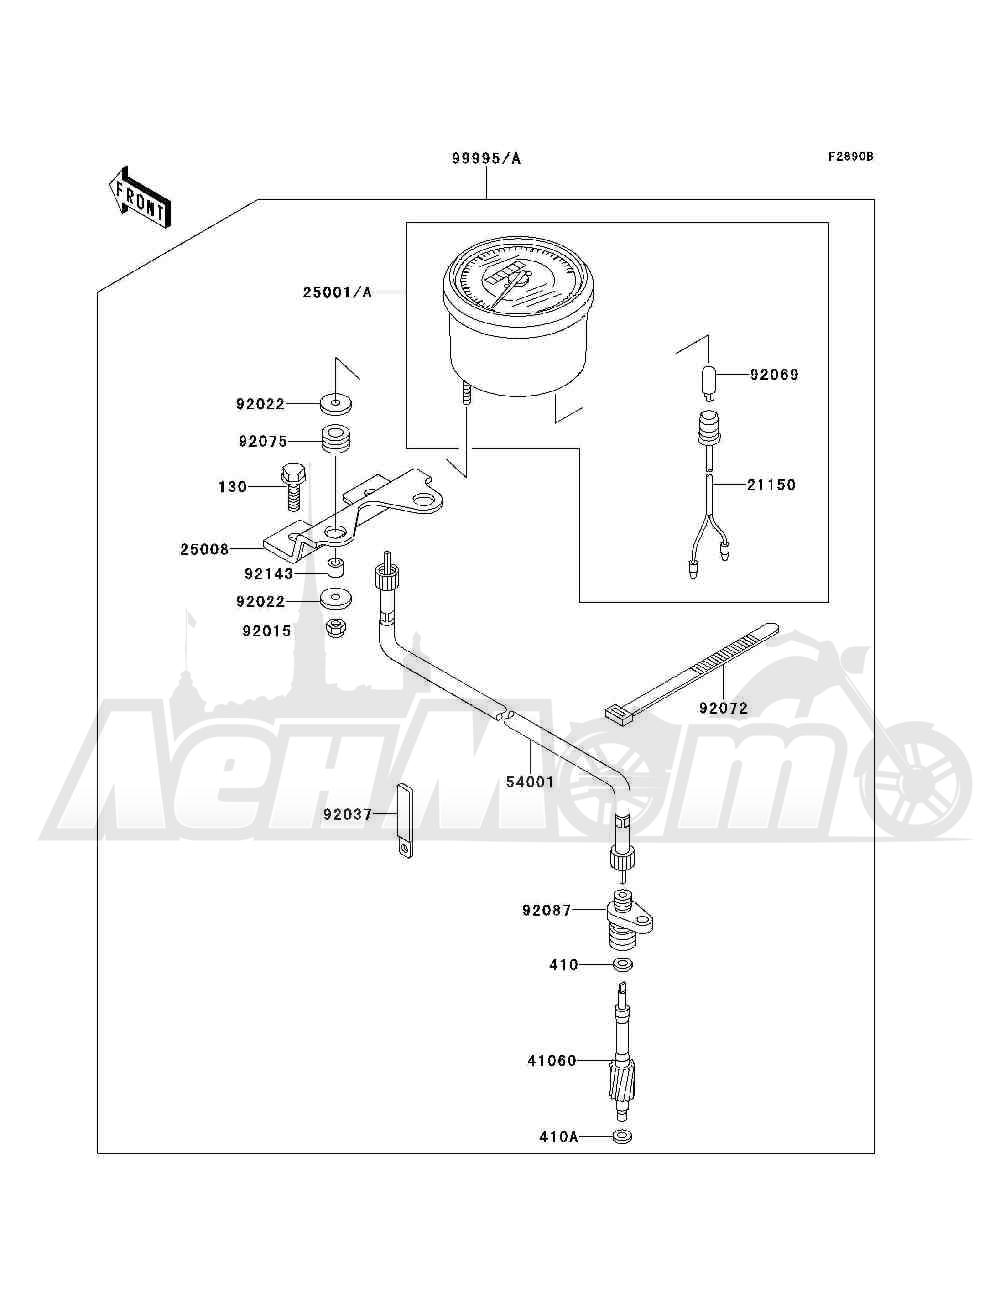 Запчасти для Квадроцикла Kawasaki 1994 BAYOU 300 4X4 (KLF300-C6) Раздел: OPTIONAL PARTS(METER) | опционально детали (счетчик)